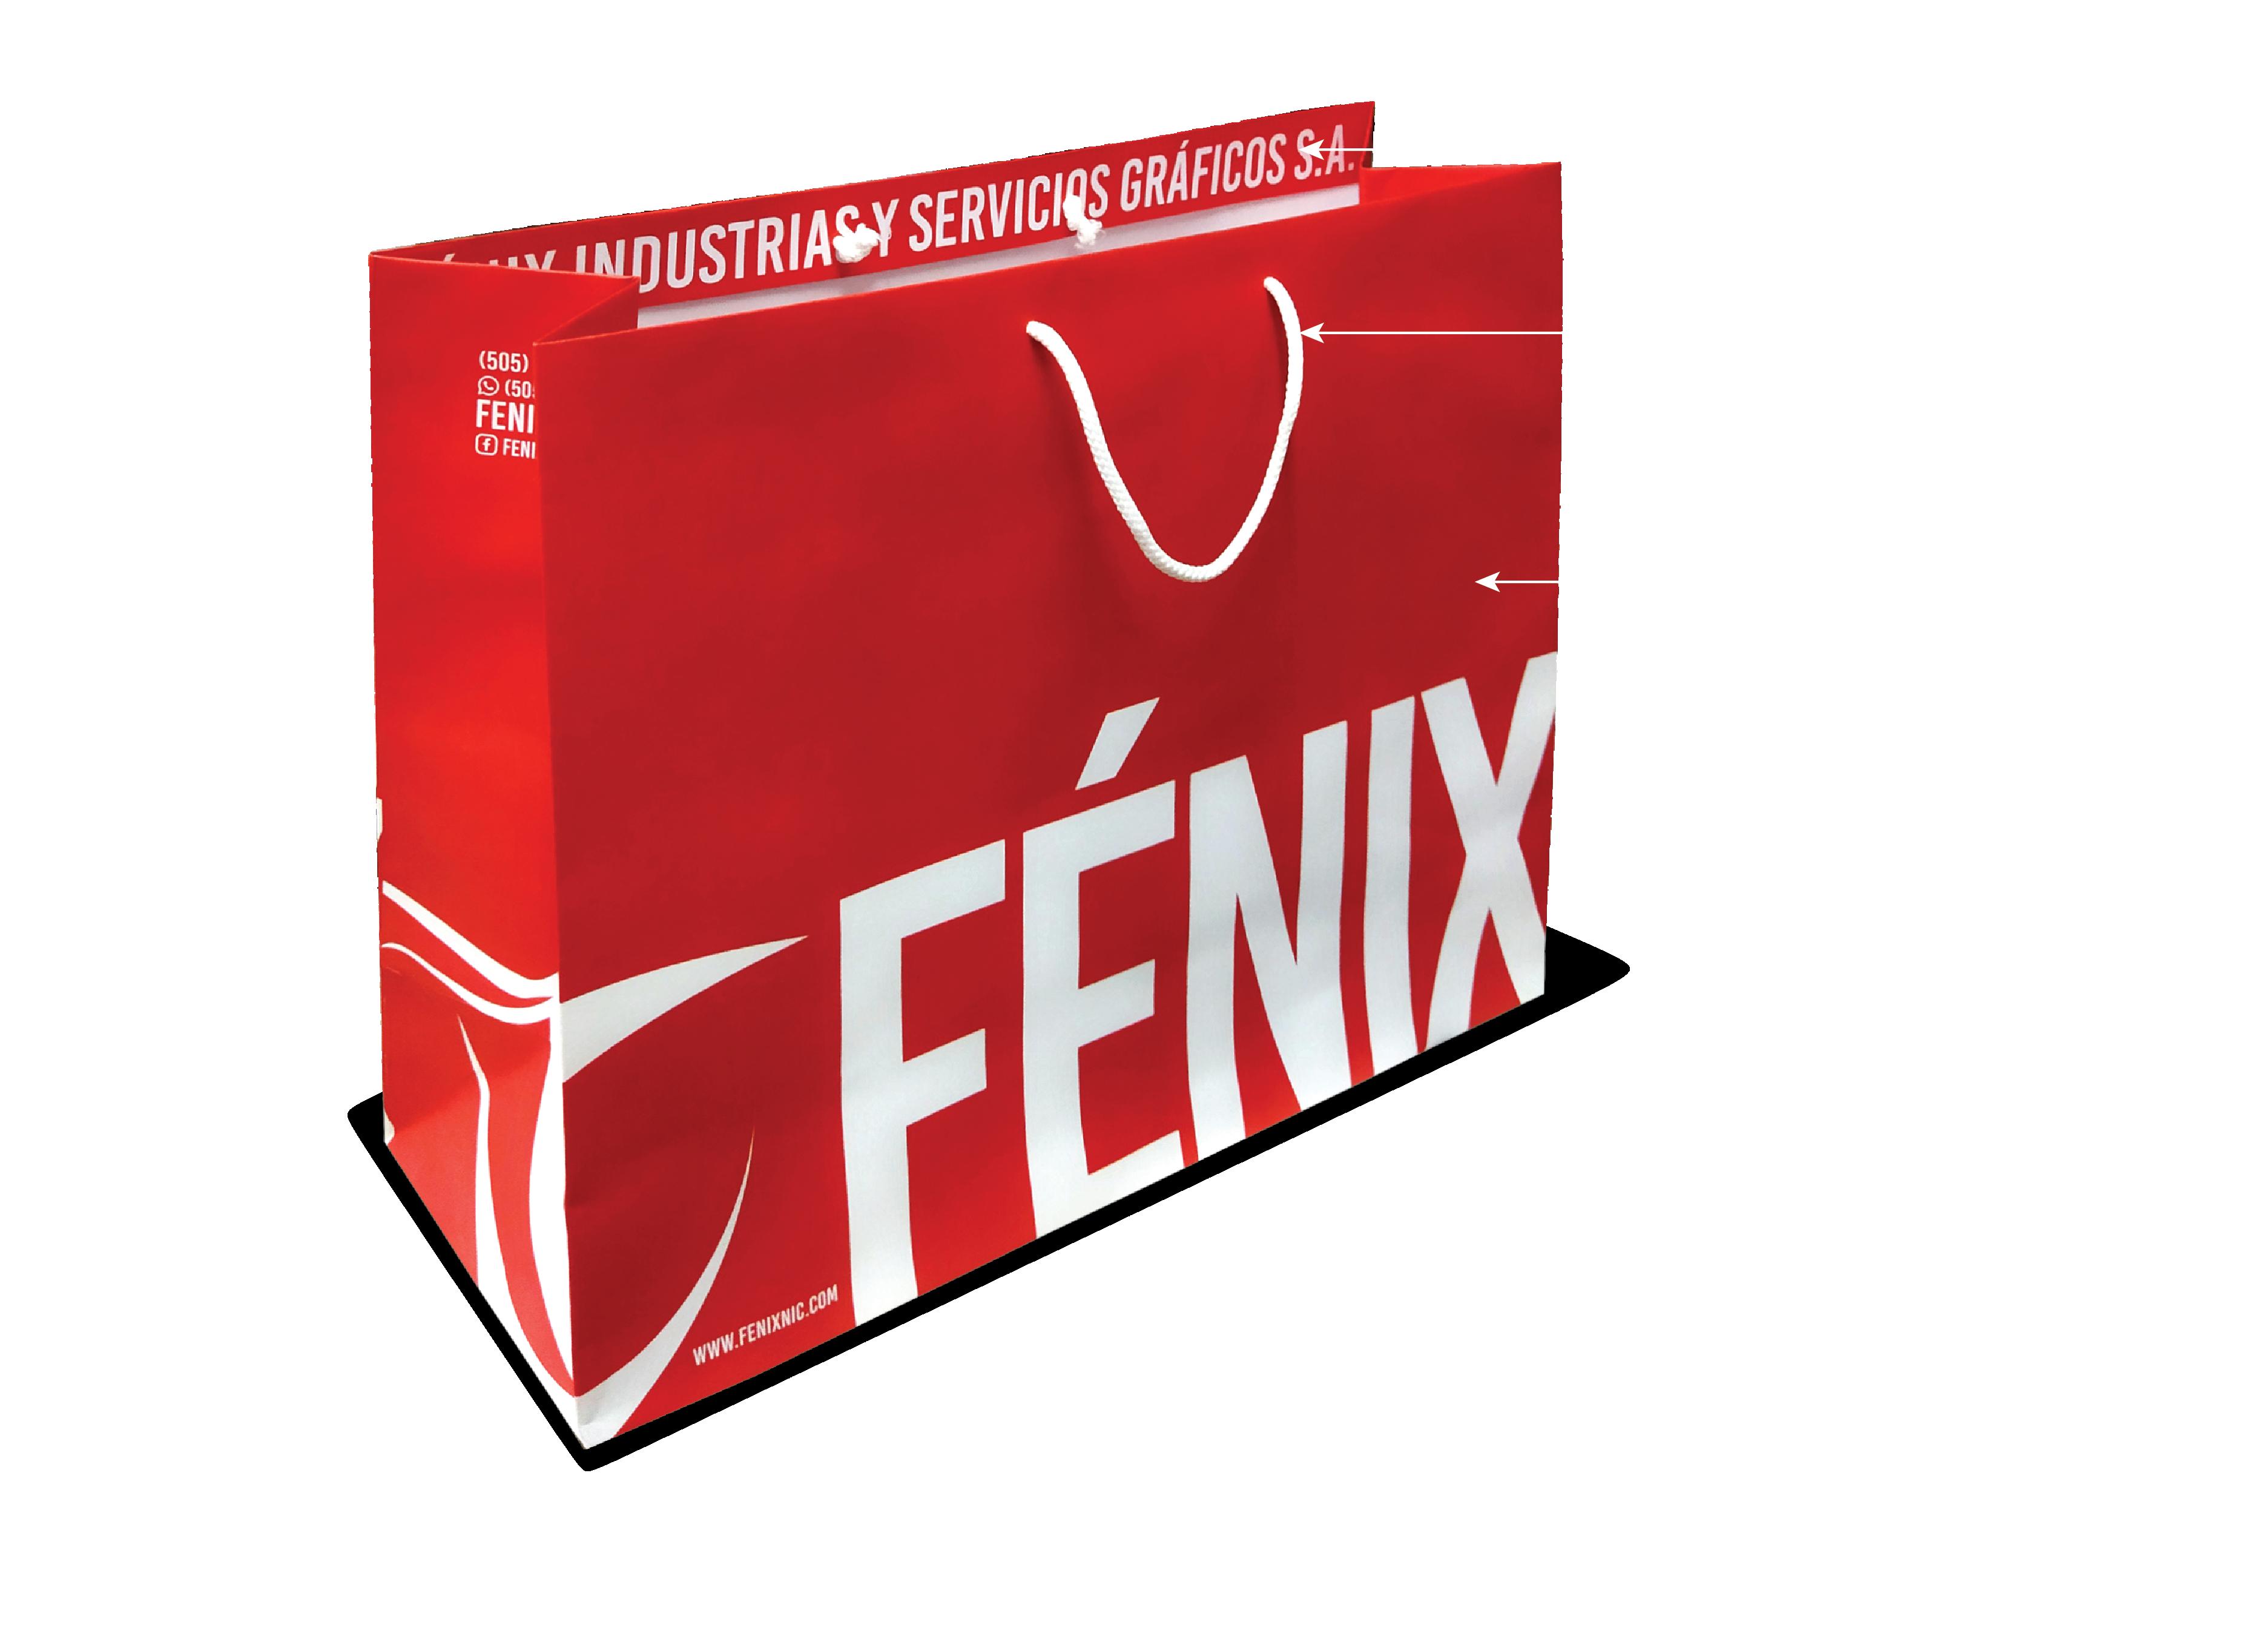 Bolsa Fenix para Web_Mesa de trabajo 1